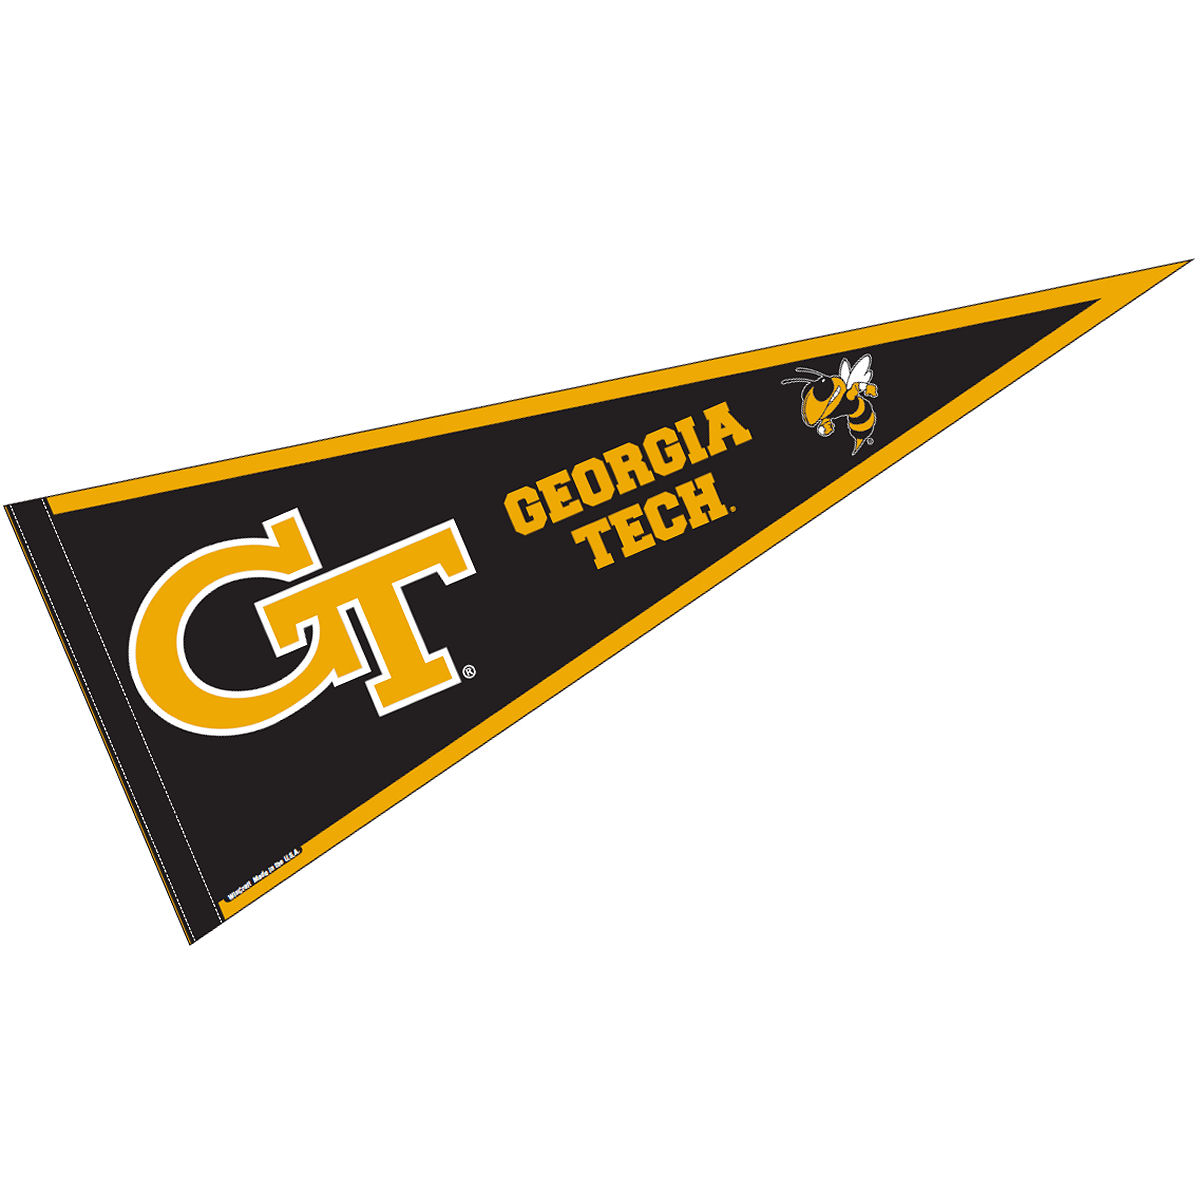 "Georgia Tech Yellow Jackets 12"" X 30"" Felt College Pennant"